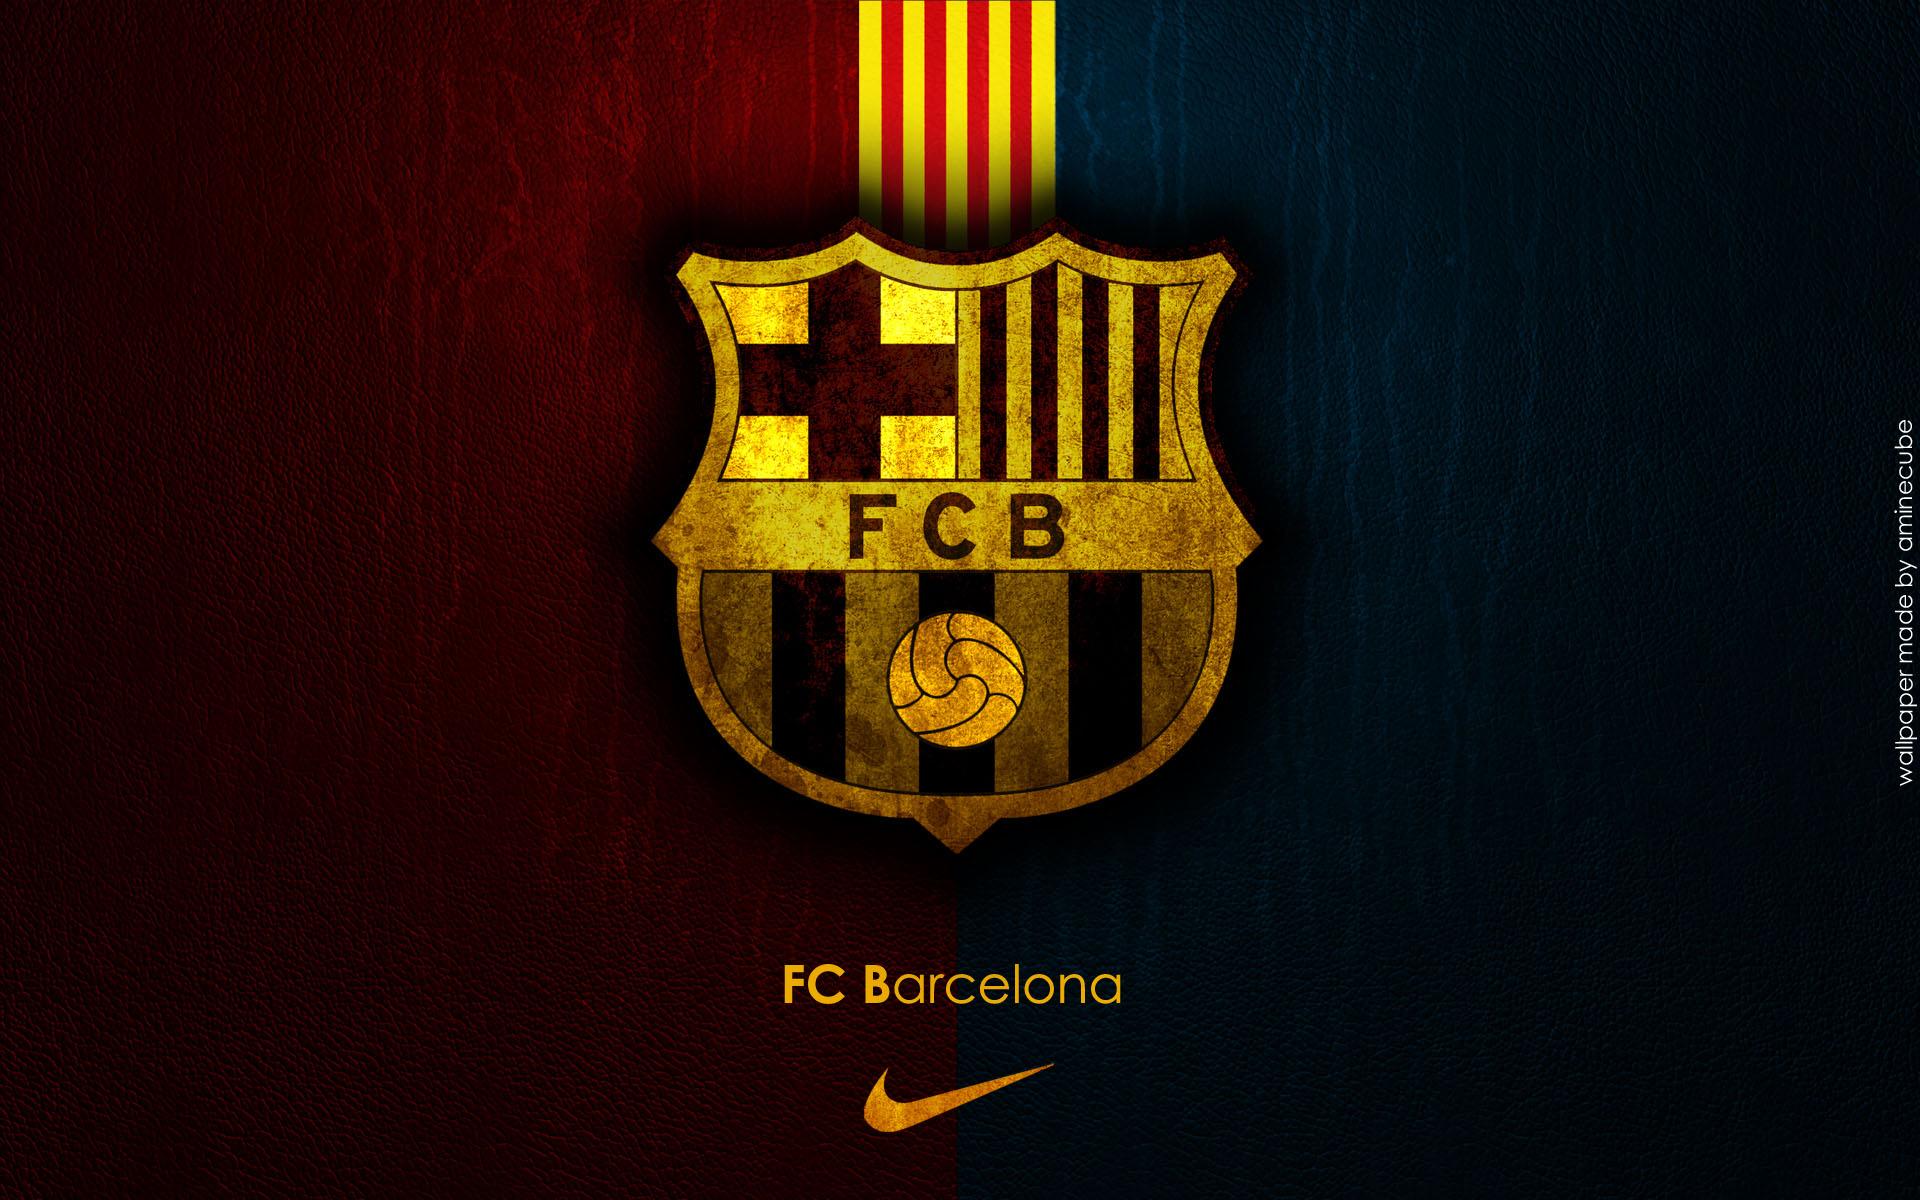 Fc Barcelona 1920x1200